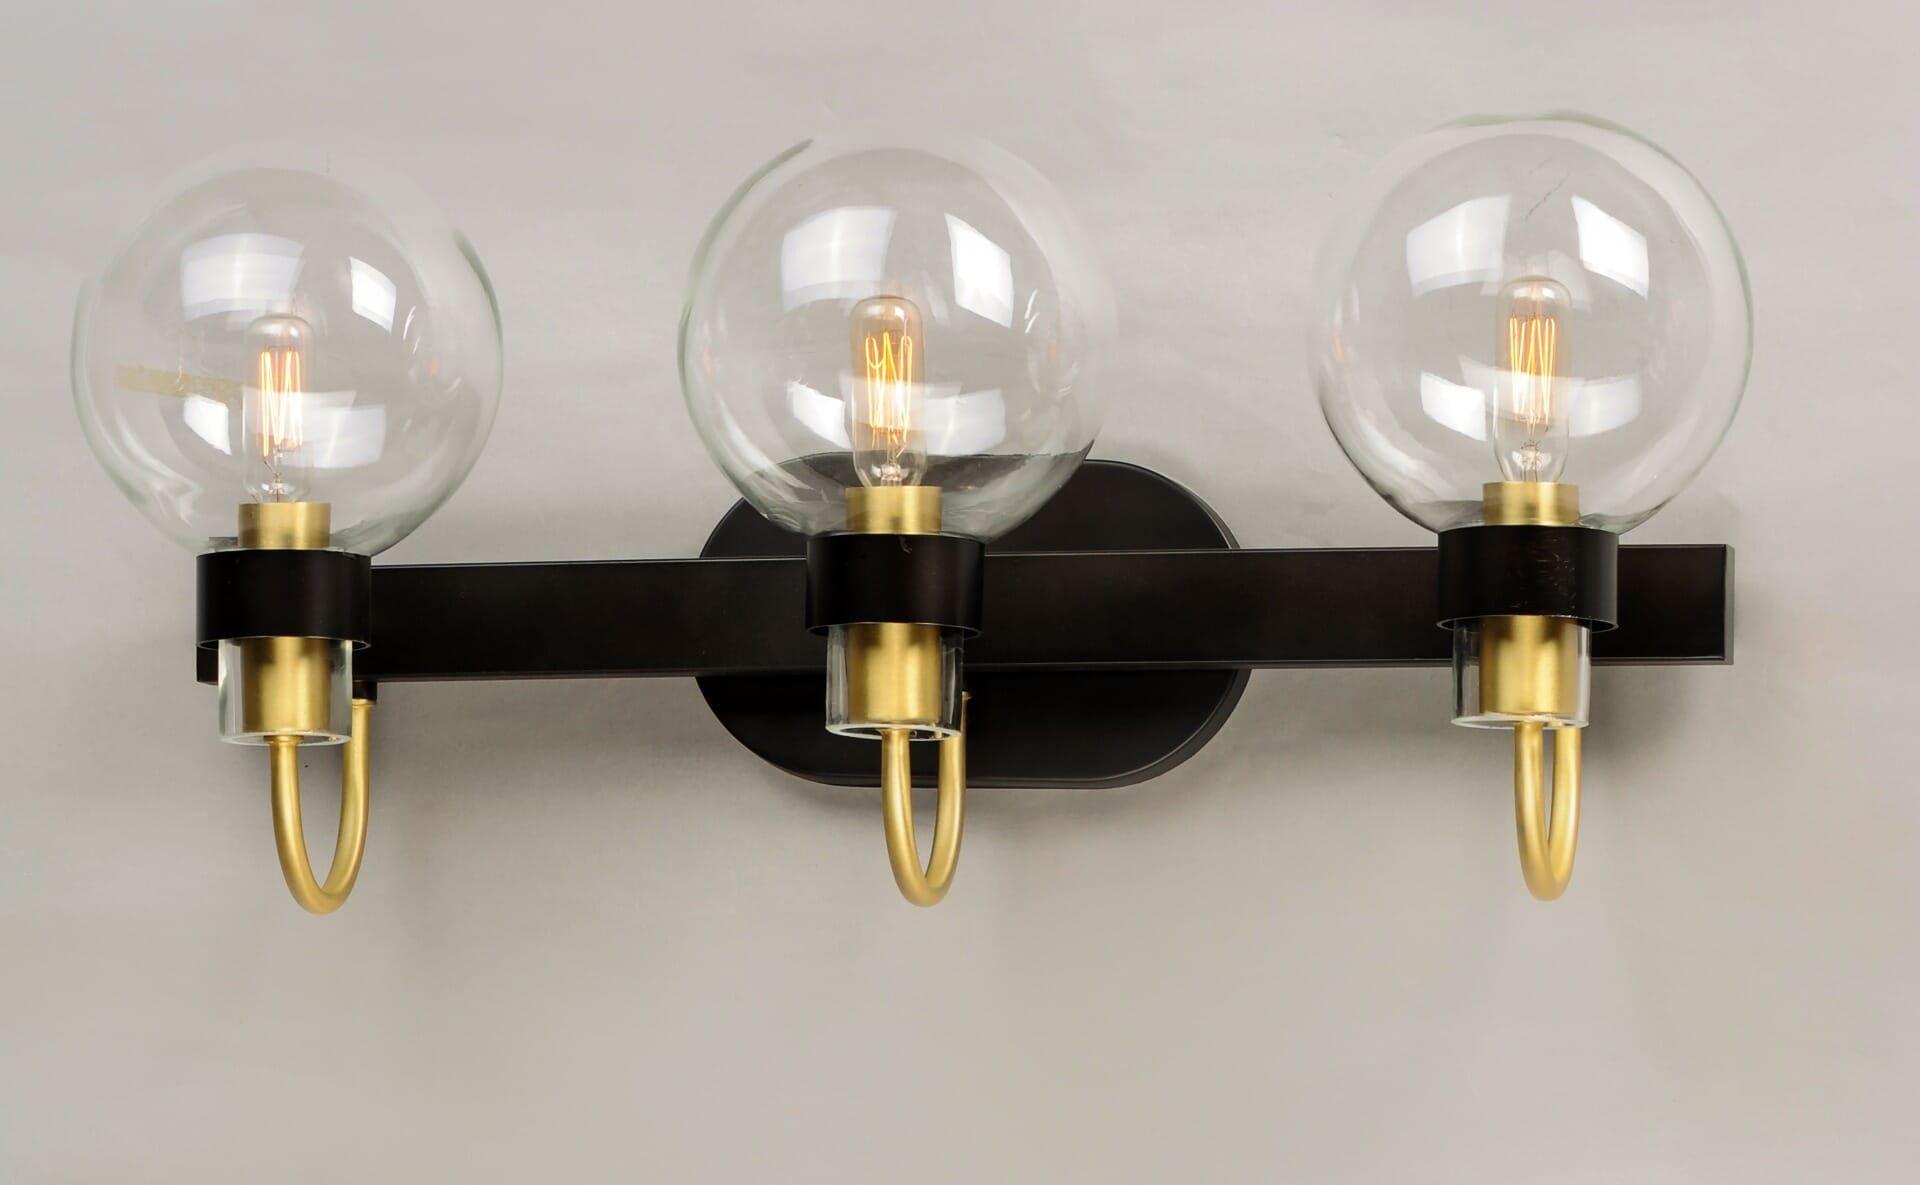 Photo of Maxim Bauhaus 3-light bathroom wash basin lamp in bronze and satin brass